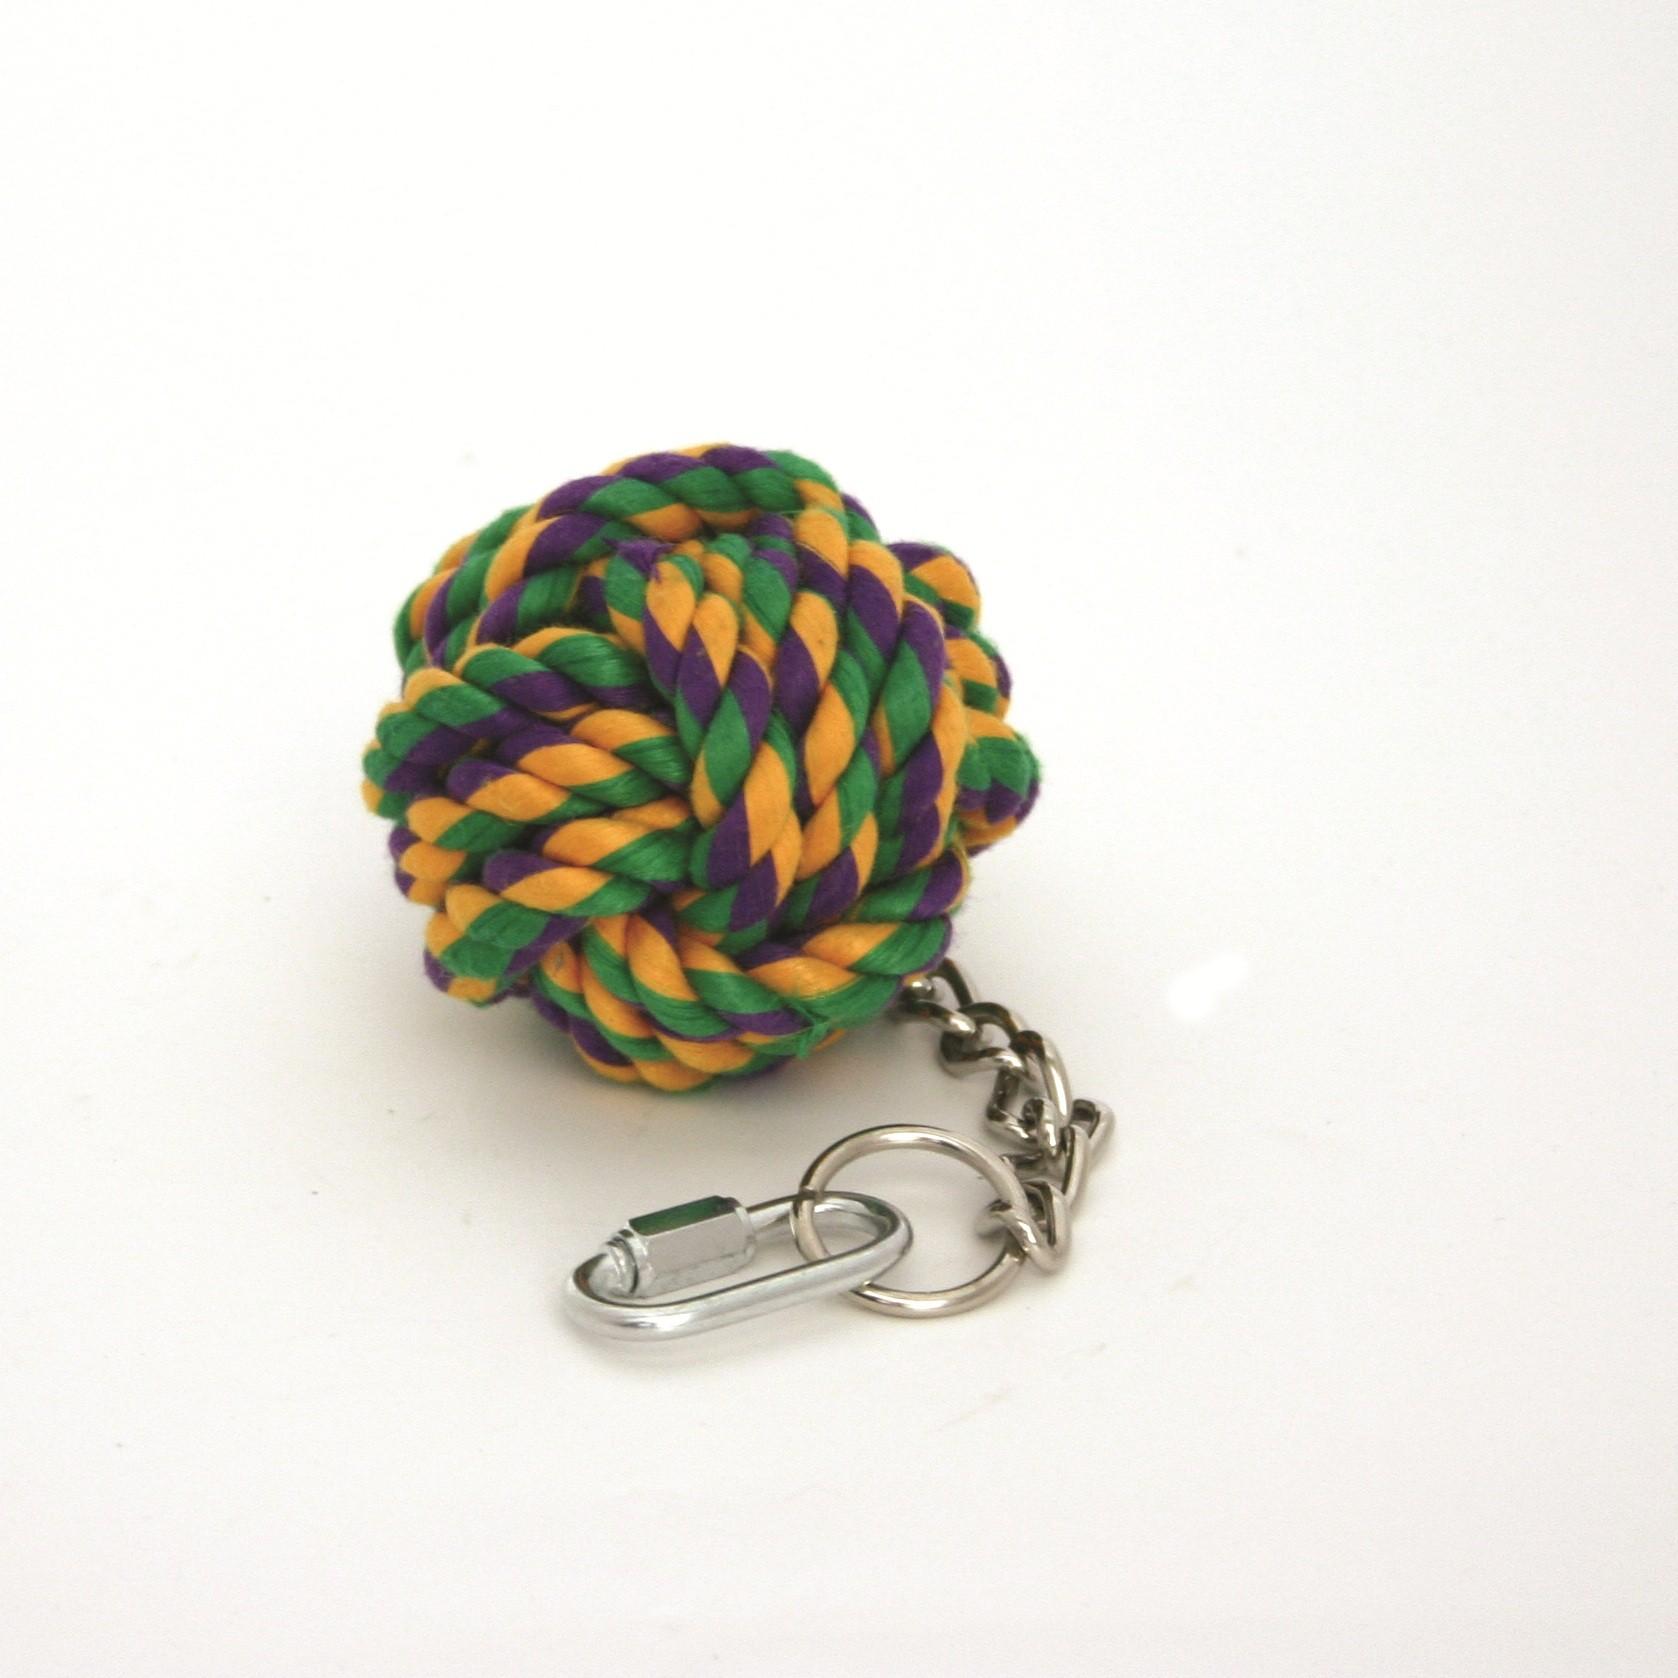 Corde boule de noeud